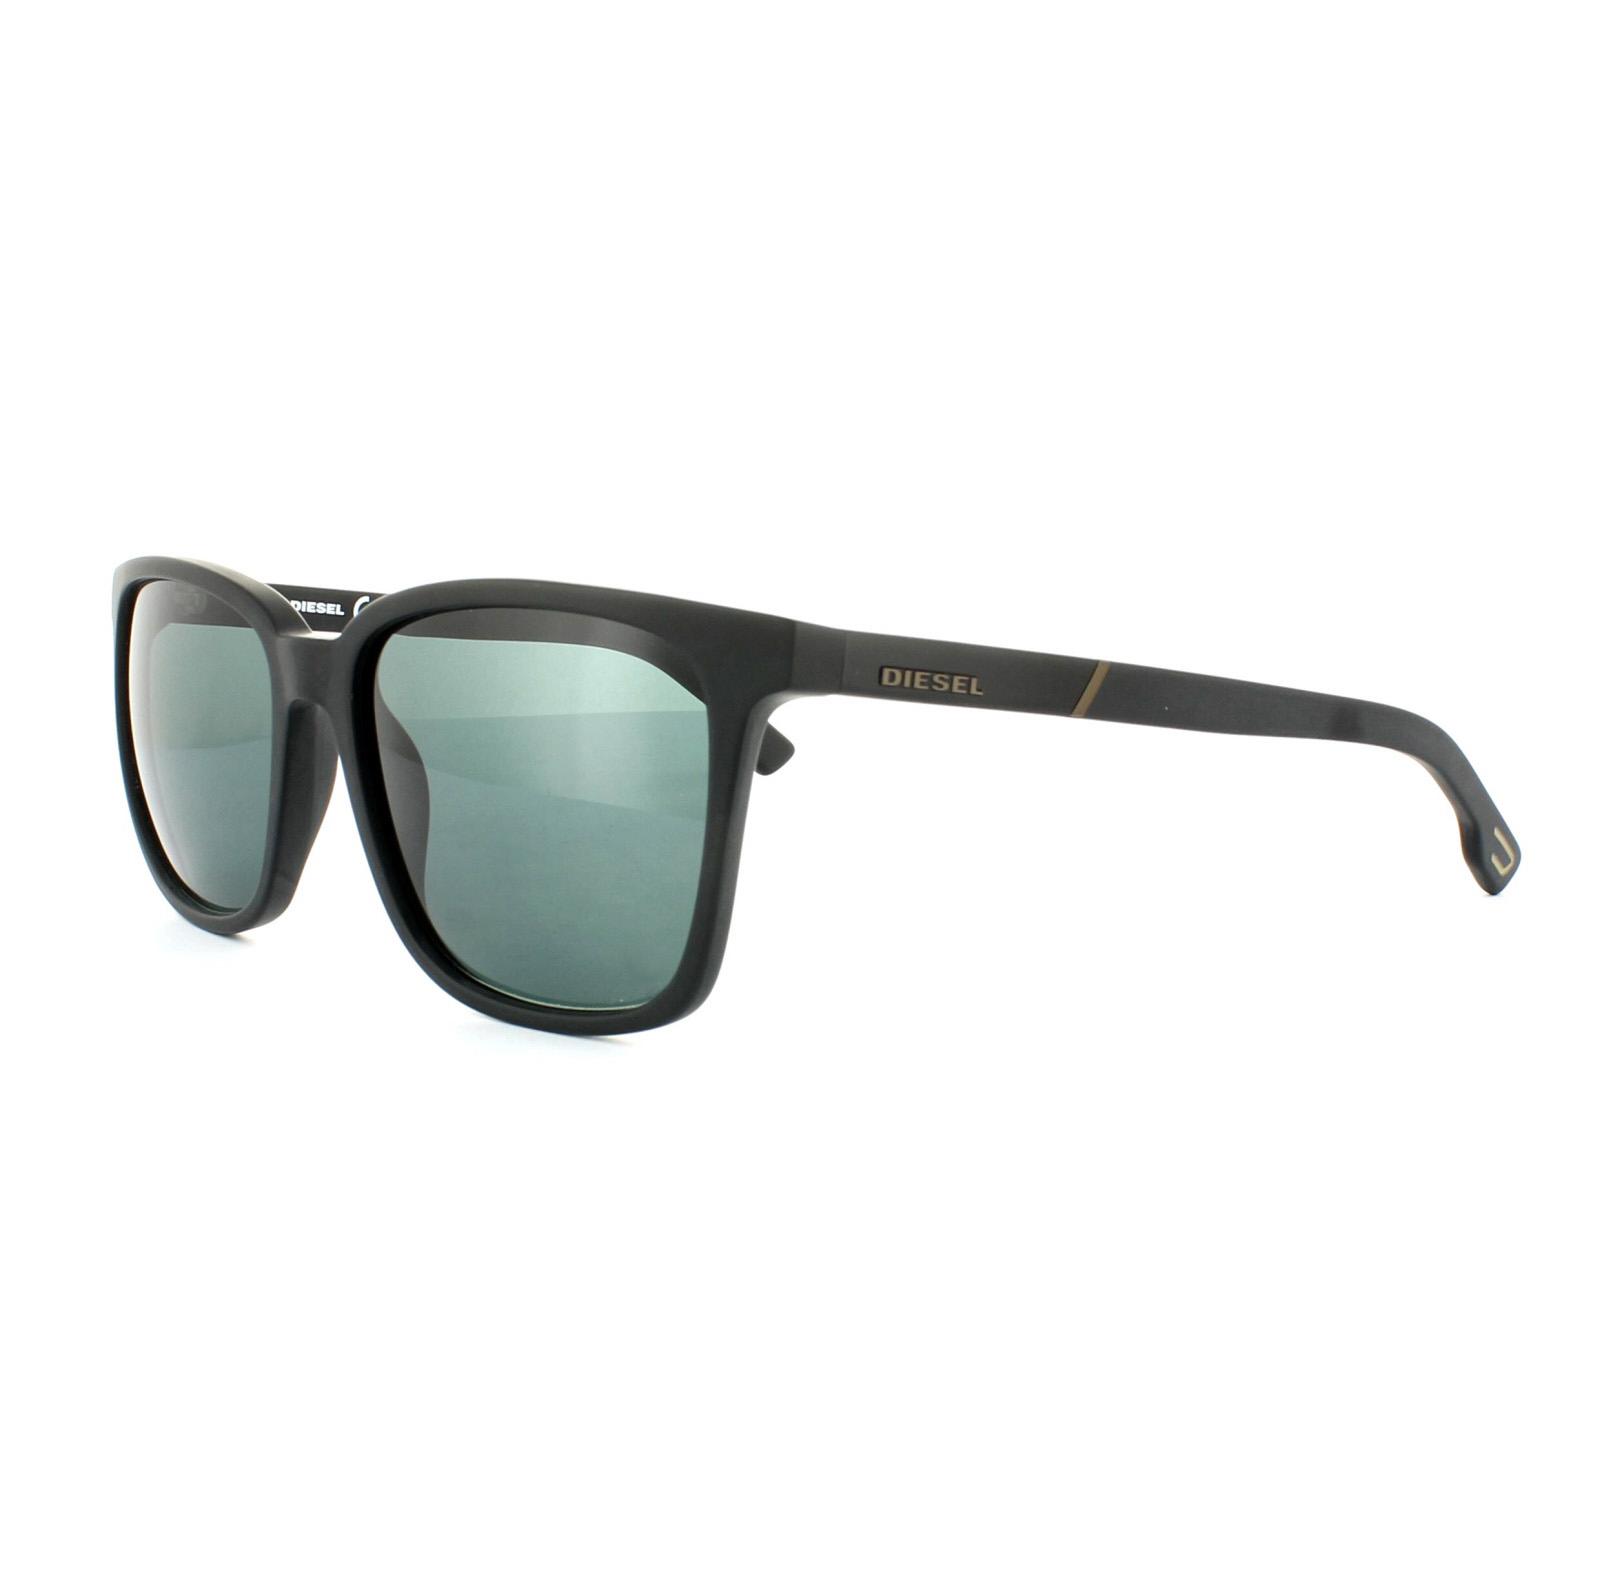 aviator frame sunglasses - Grey Diesel sjznrO6